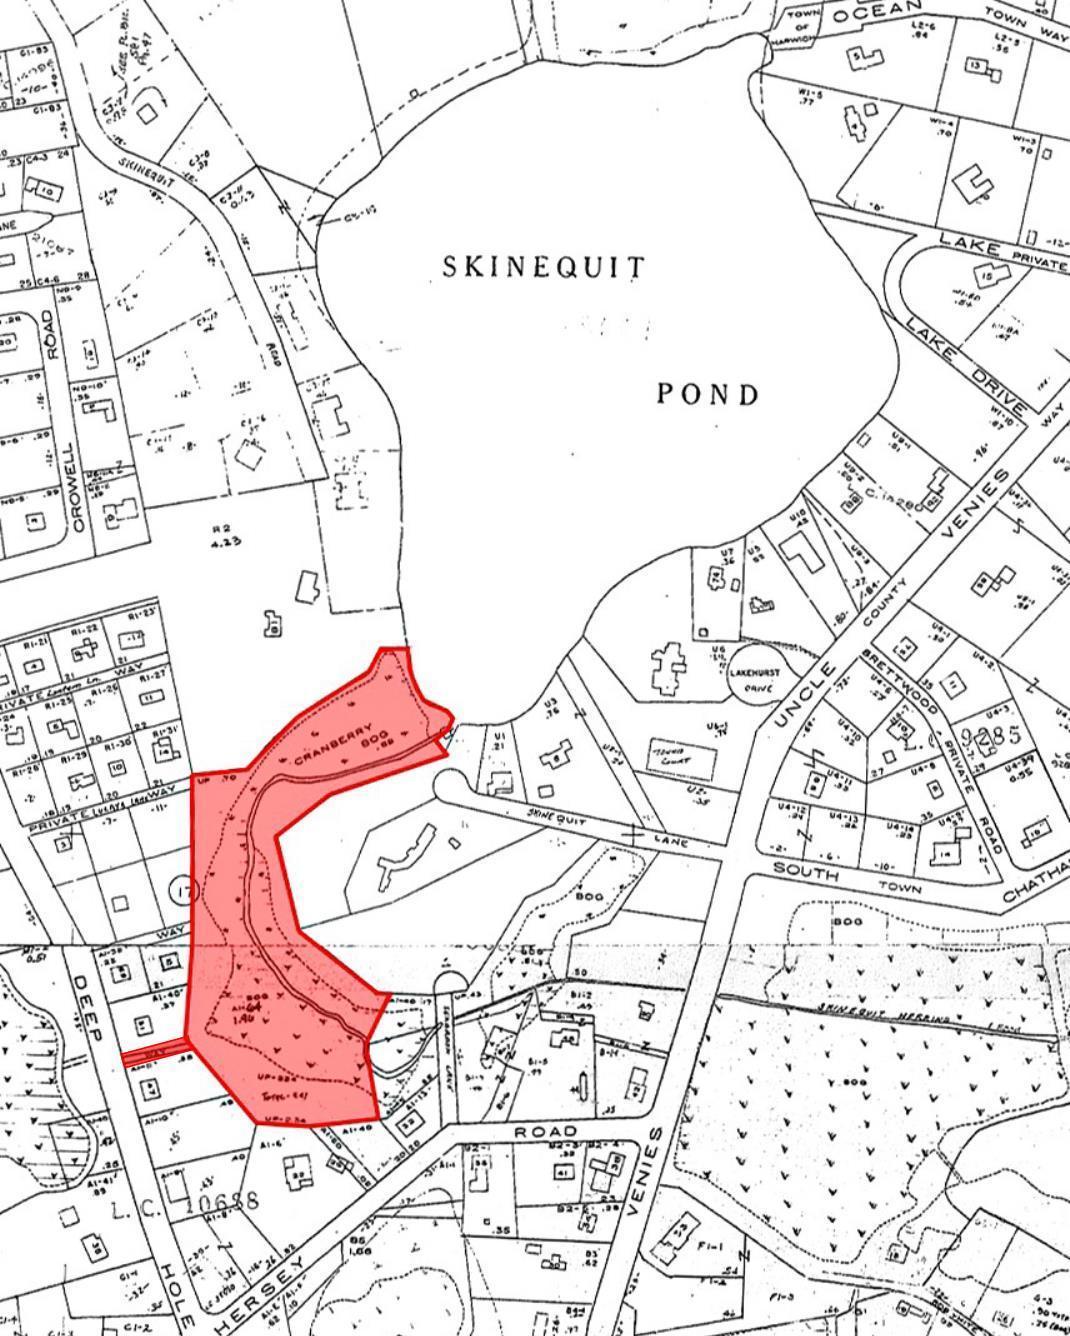 0 Deep Hole Road, Harwich Port MA, 02646 - slide 2